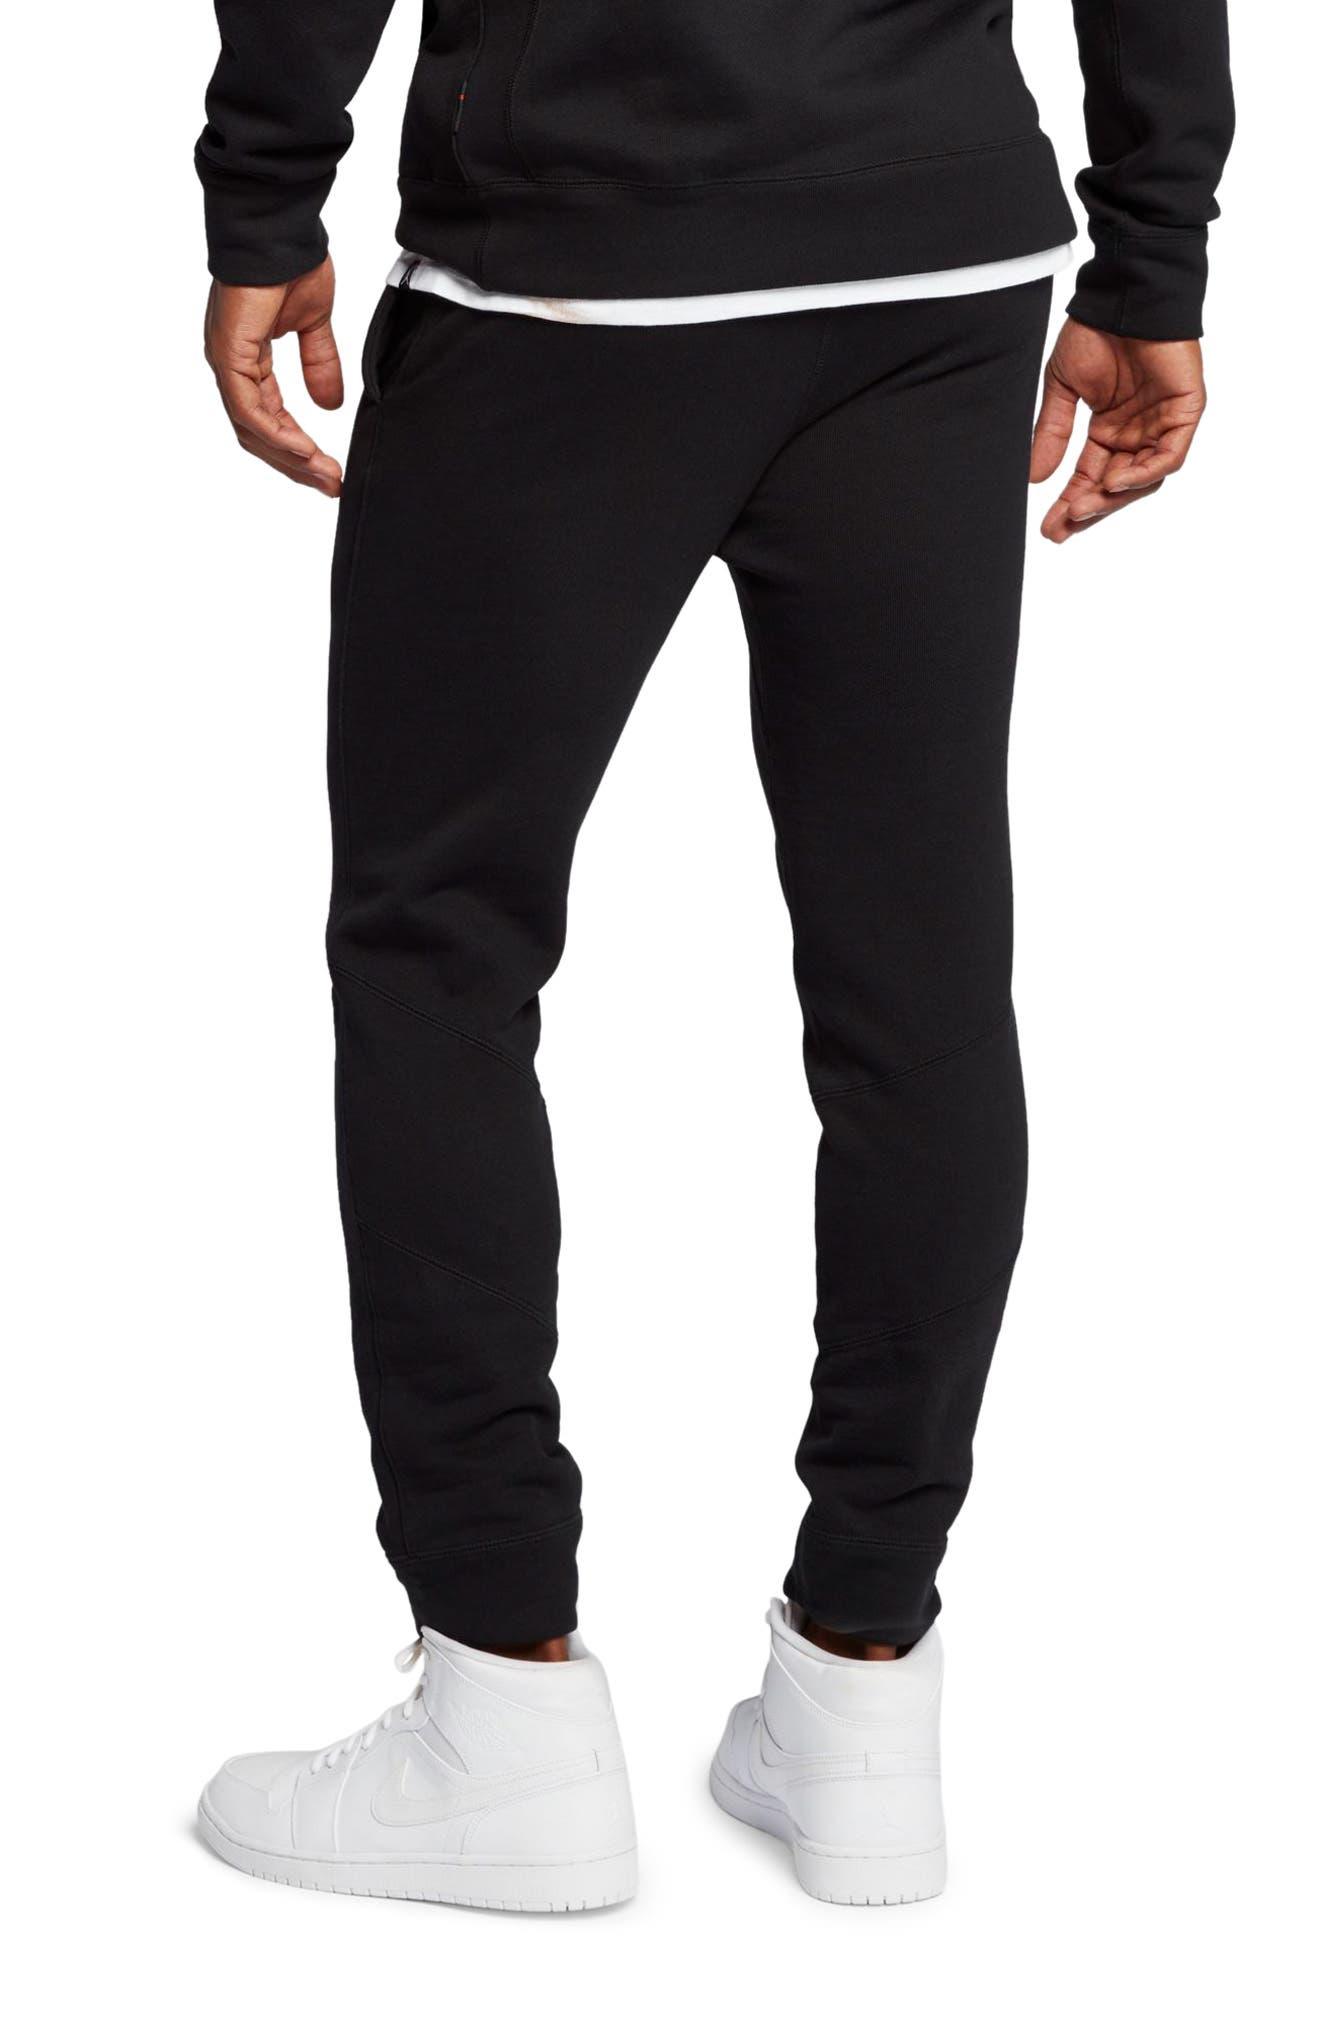 JORDAN, Wings Fleece Pants, Alternate thumbnail 2, color, BLACK/ BLACK